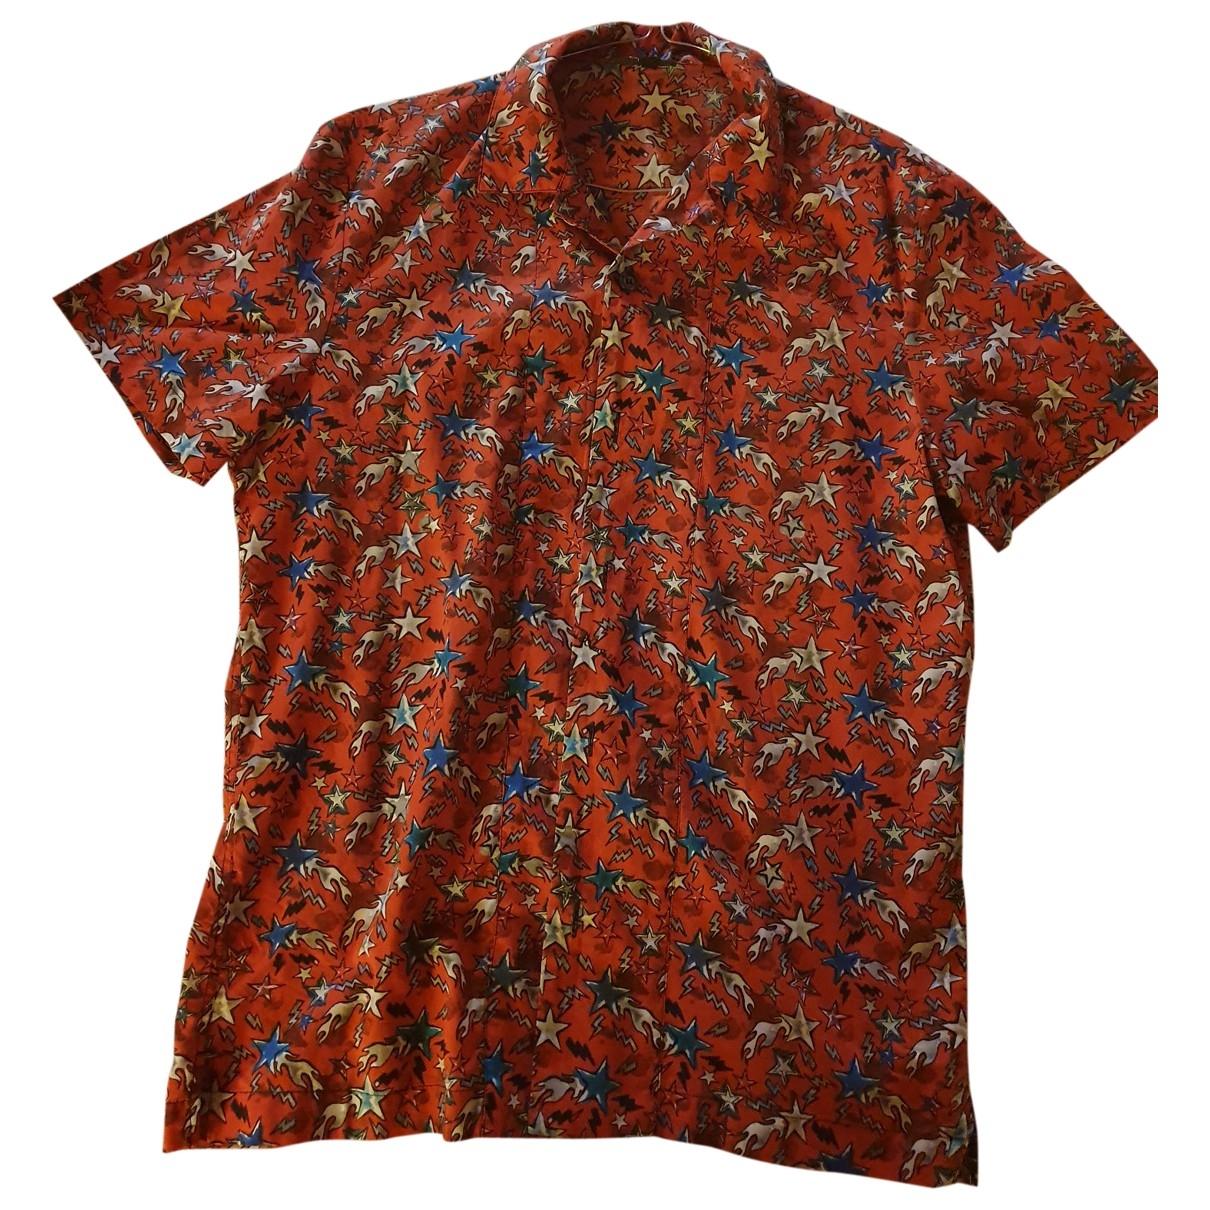 Just Cavalli \N Red Shirts for Men M International